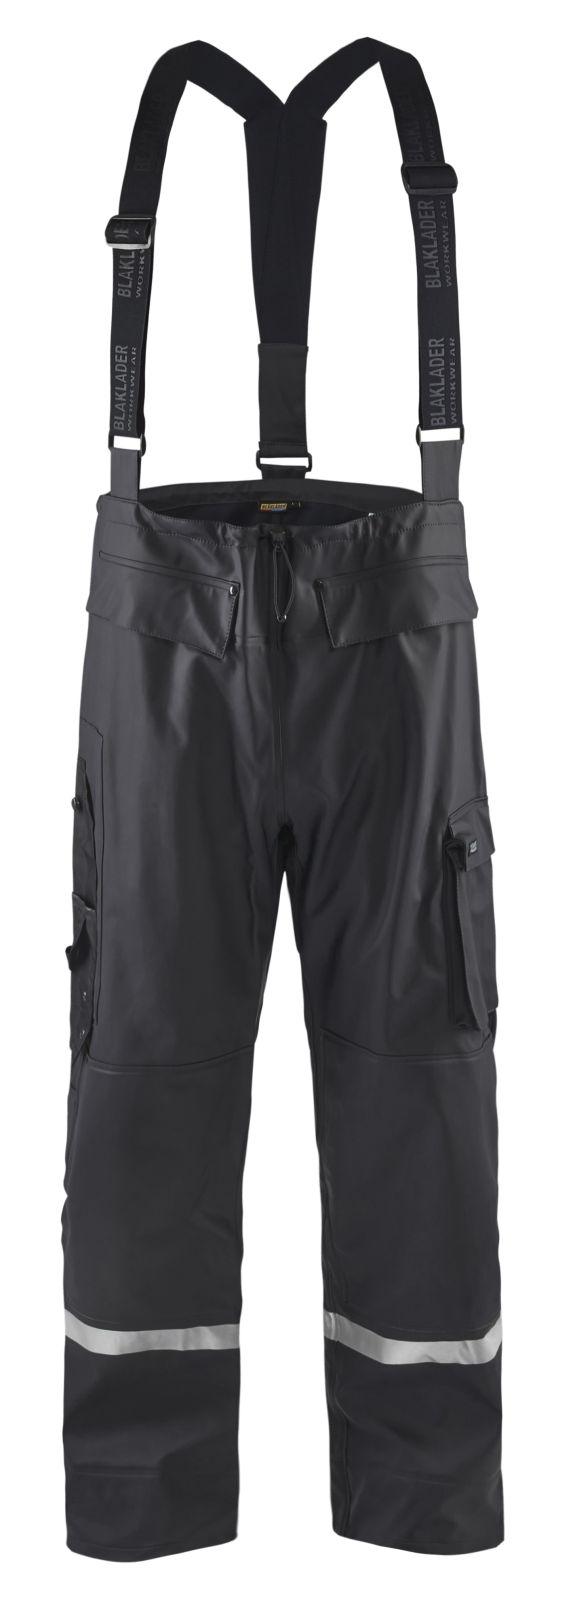 Blaklader Regenbroeken 13022003 High Vis zwart(9900)